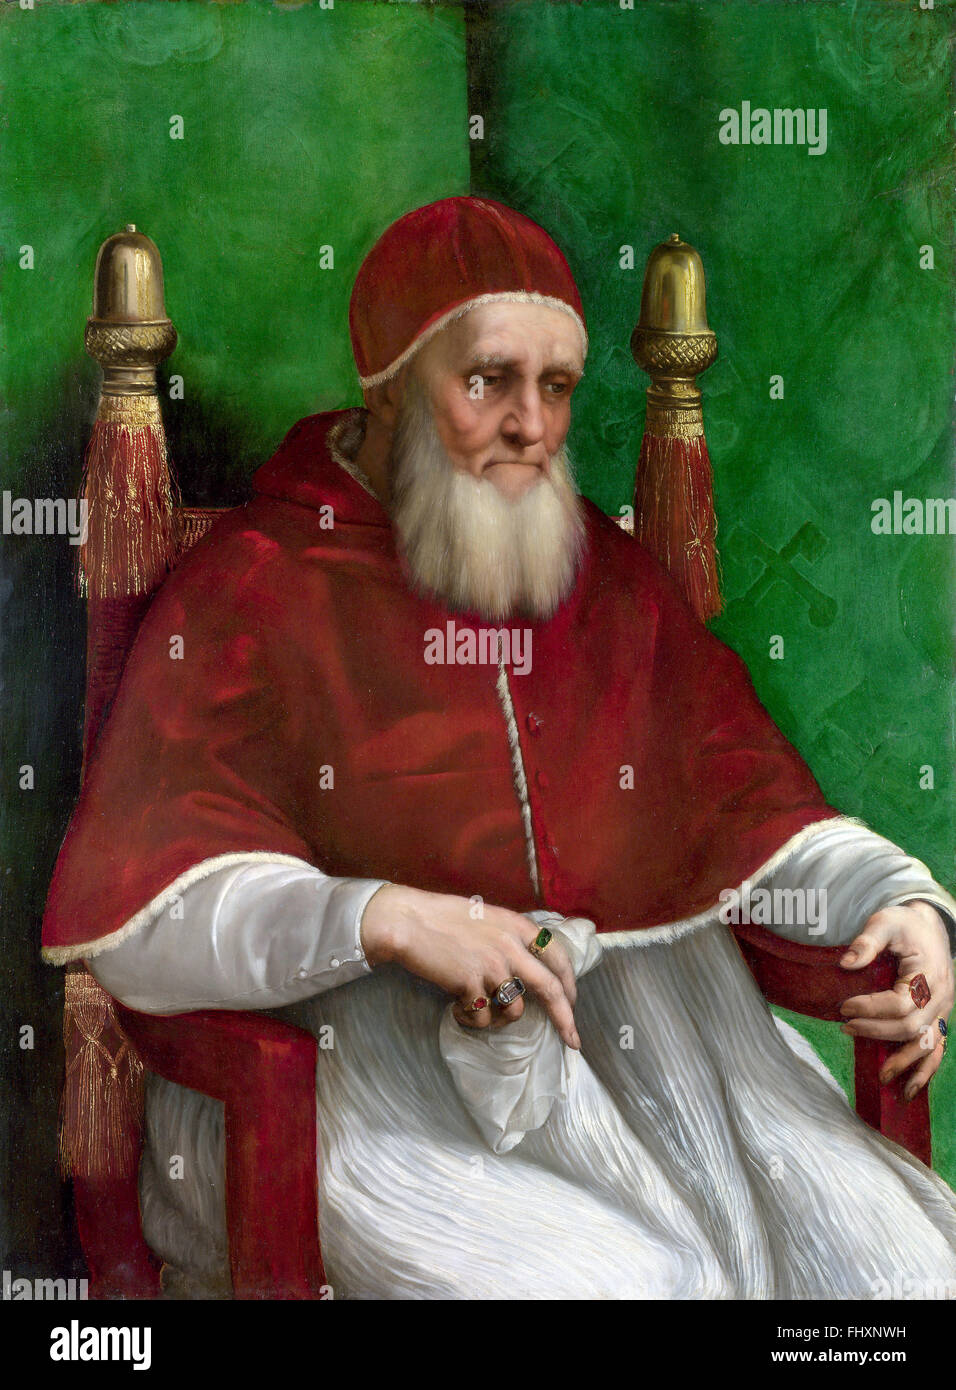 Pope Julius II - Stock Image